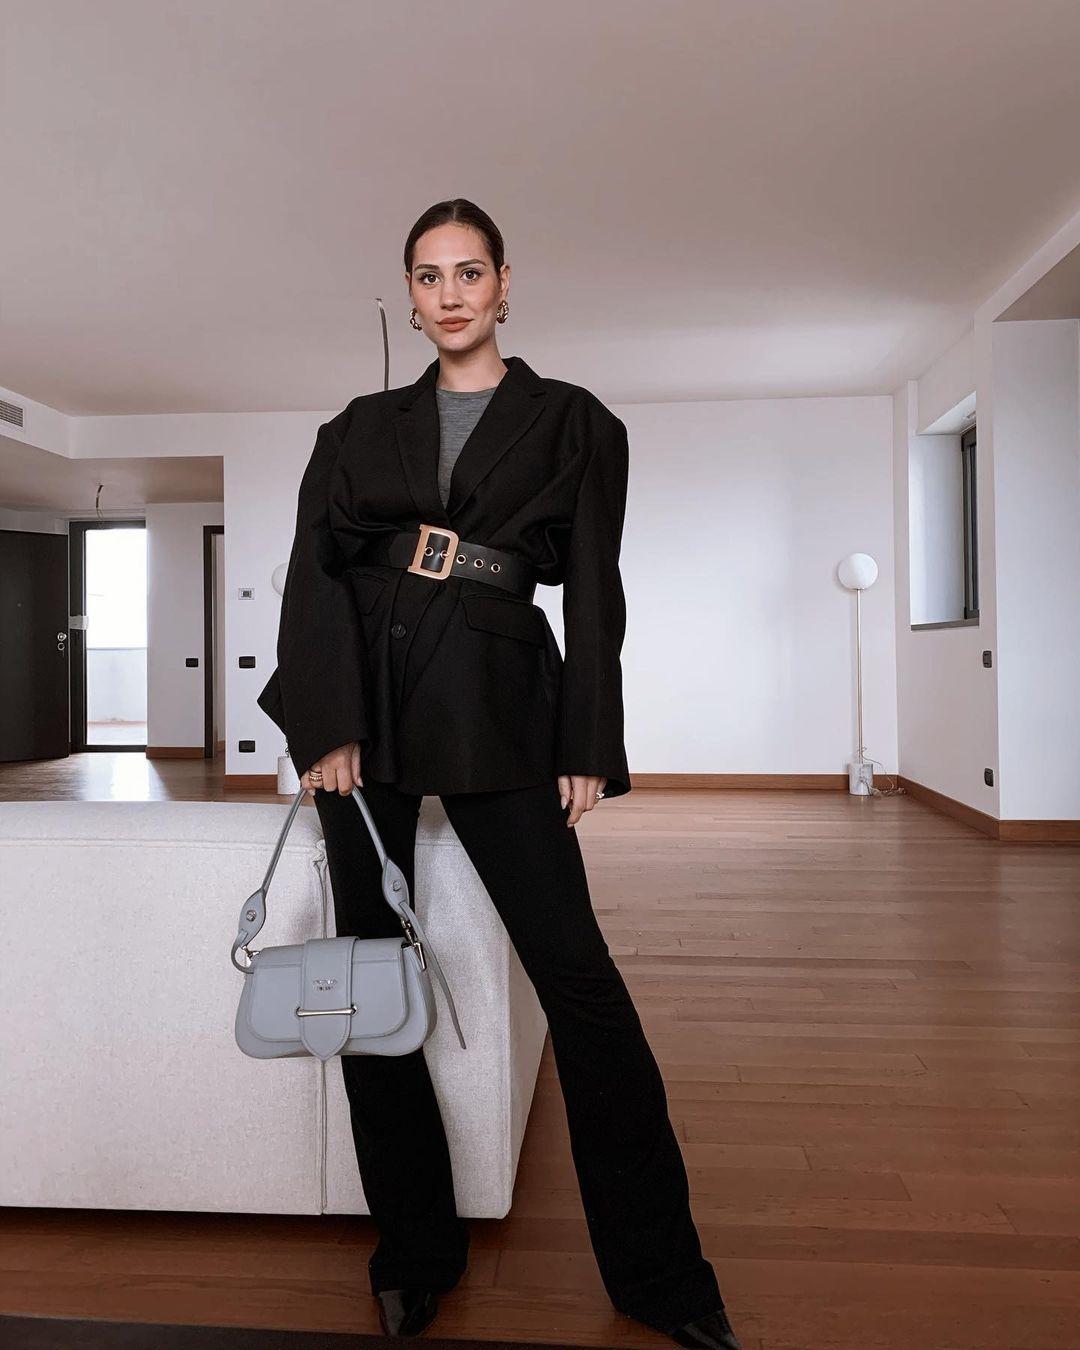 Beatrice-Valli-Wallpapers-Insta-Fit-Bio-7